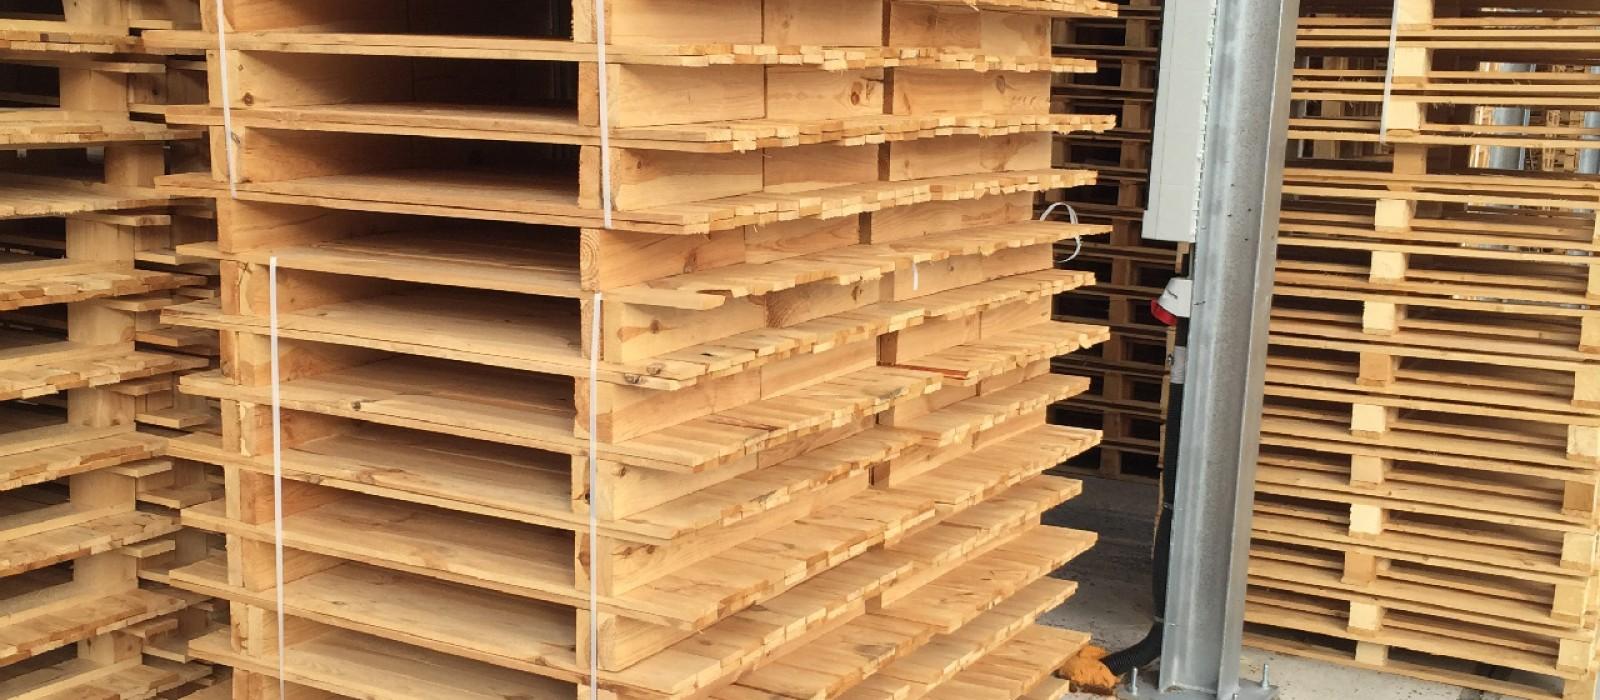 Laminat-Holzpalette-1100x420mm